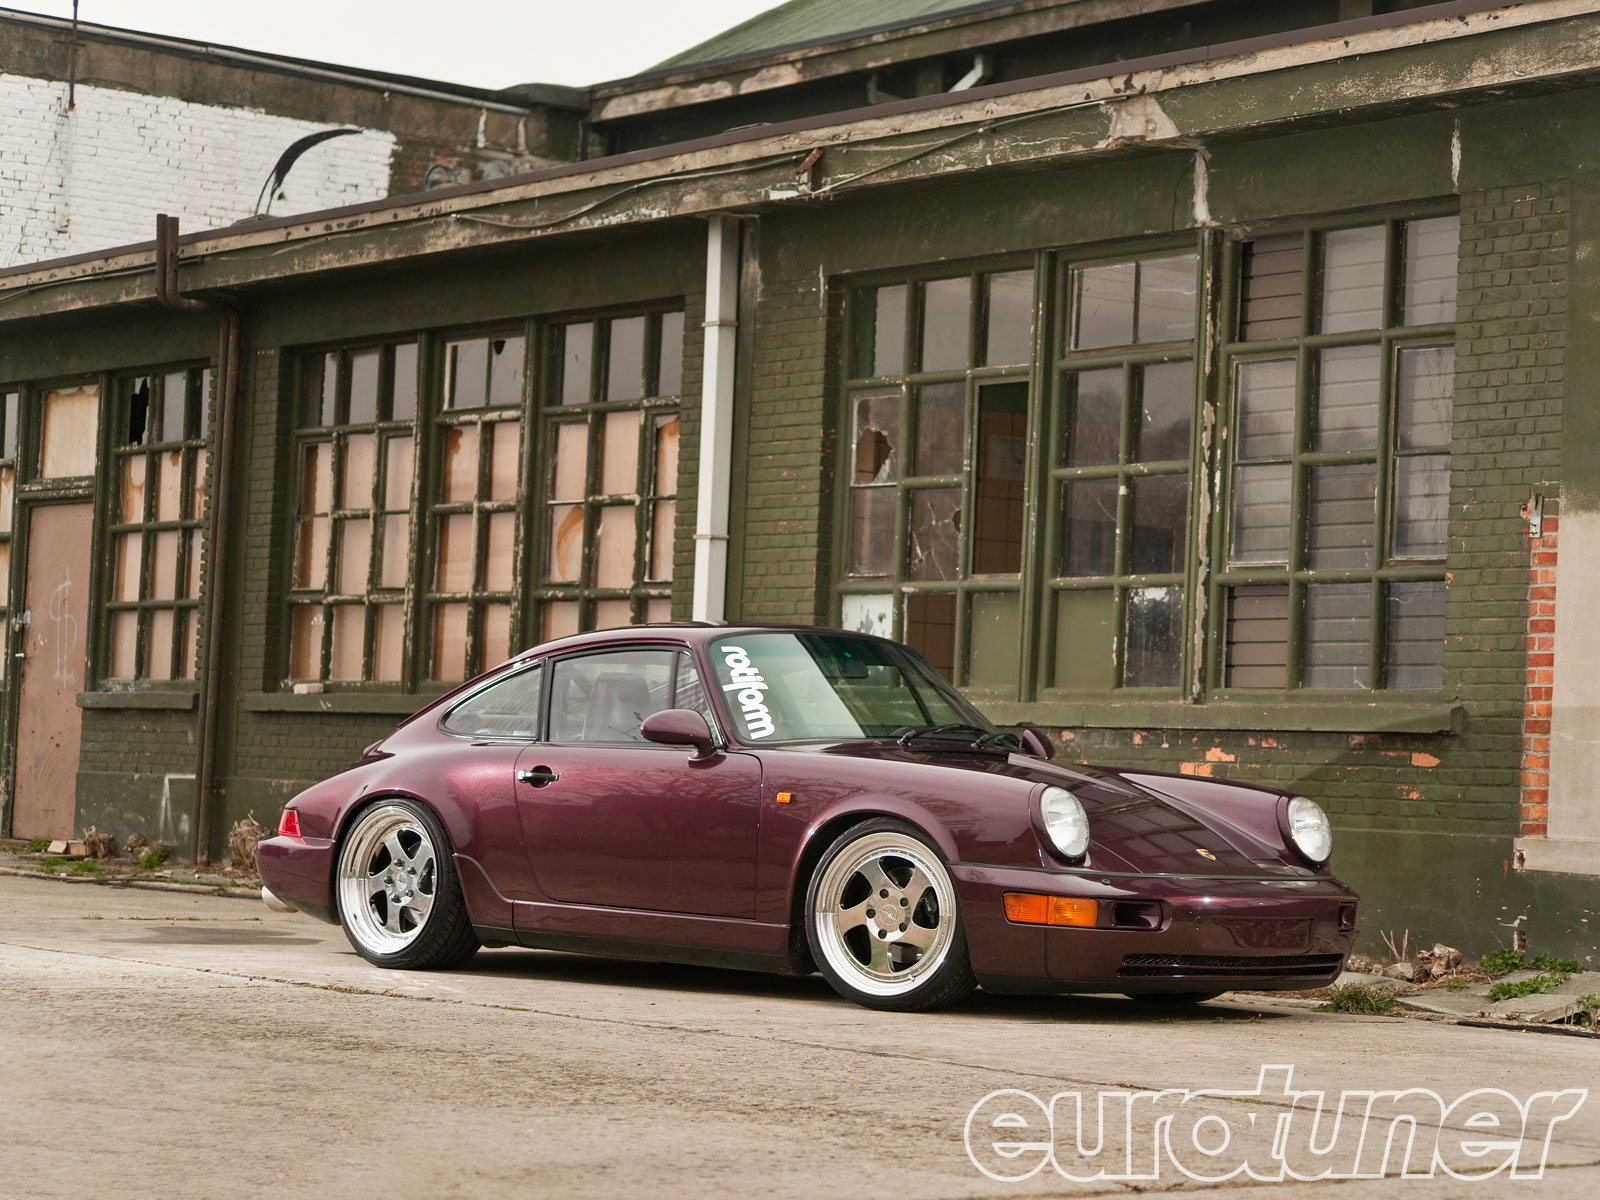 Kristof Mombaerts' 1991 Porsche 911 Carrera 4 Photo & Image